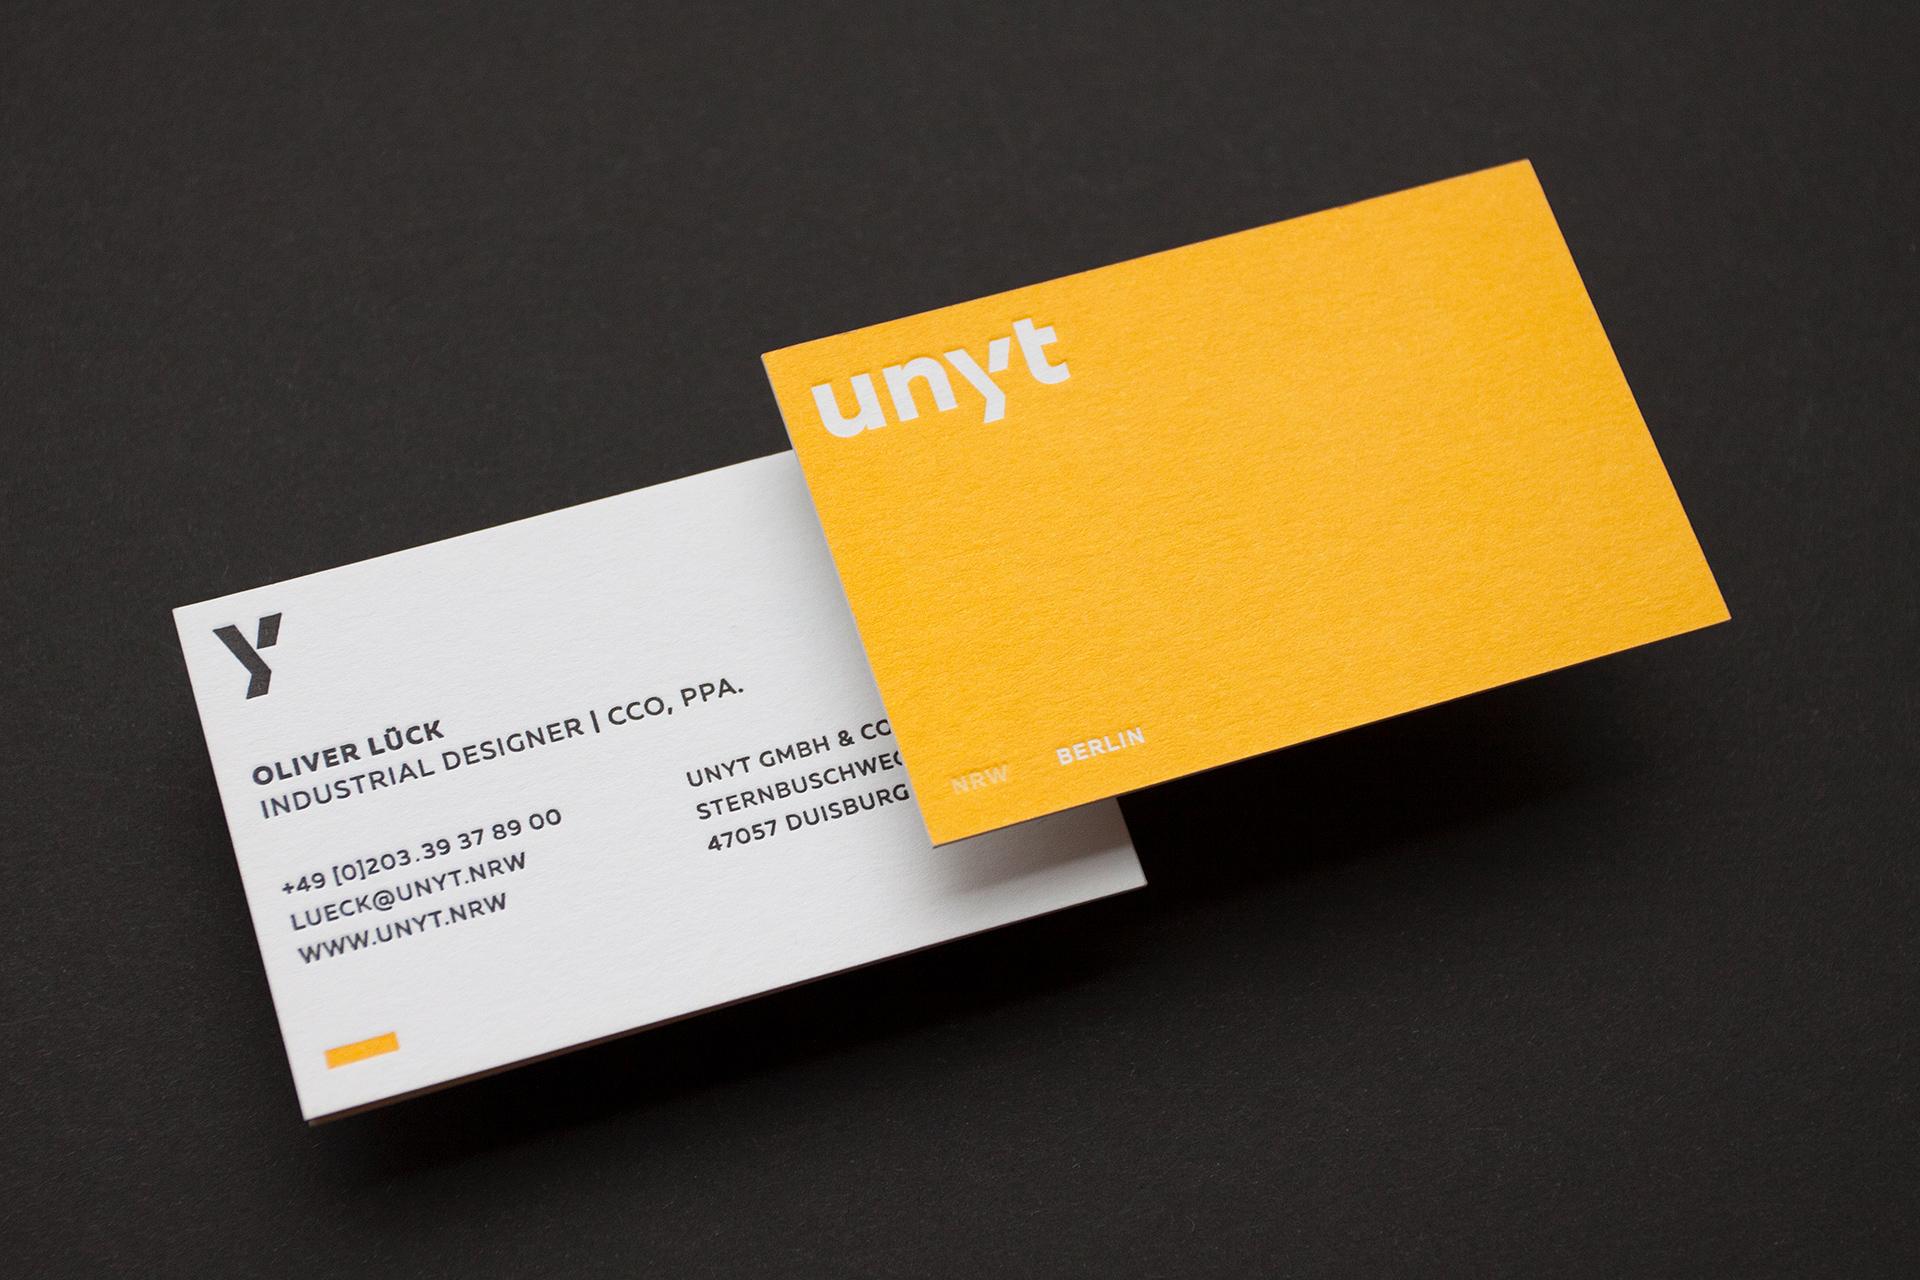 unyt-businesscard-2821